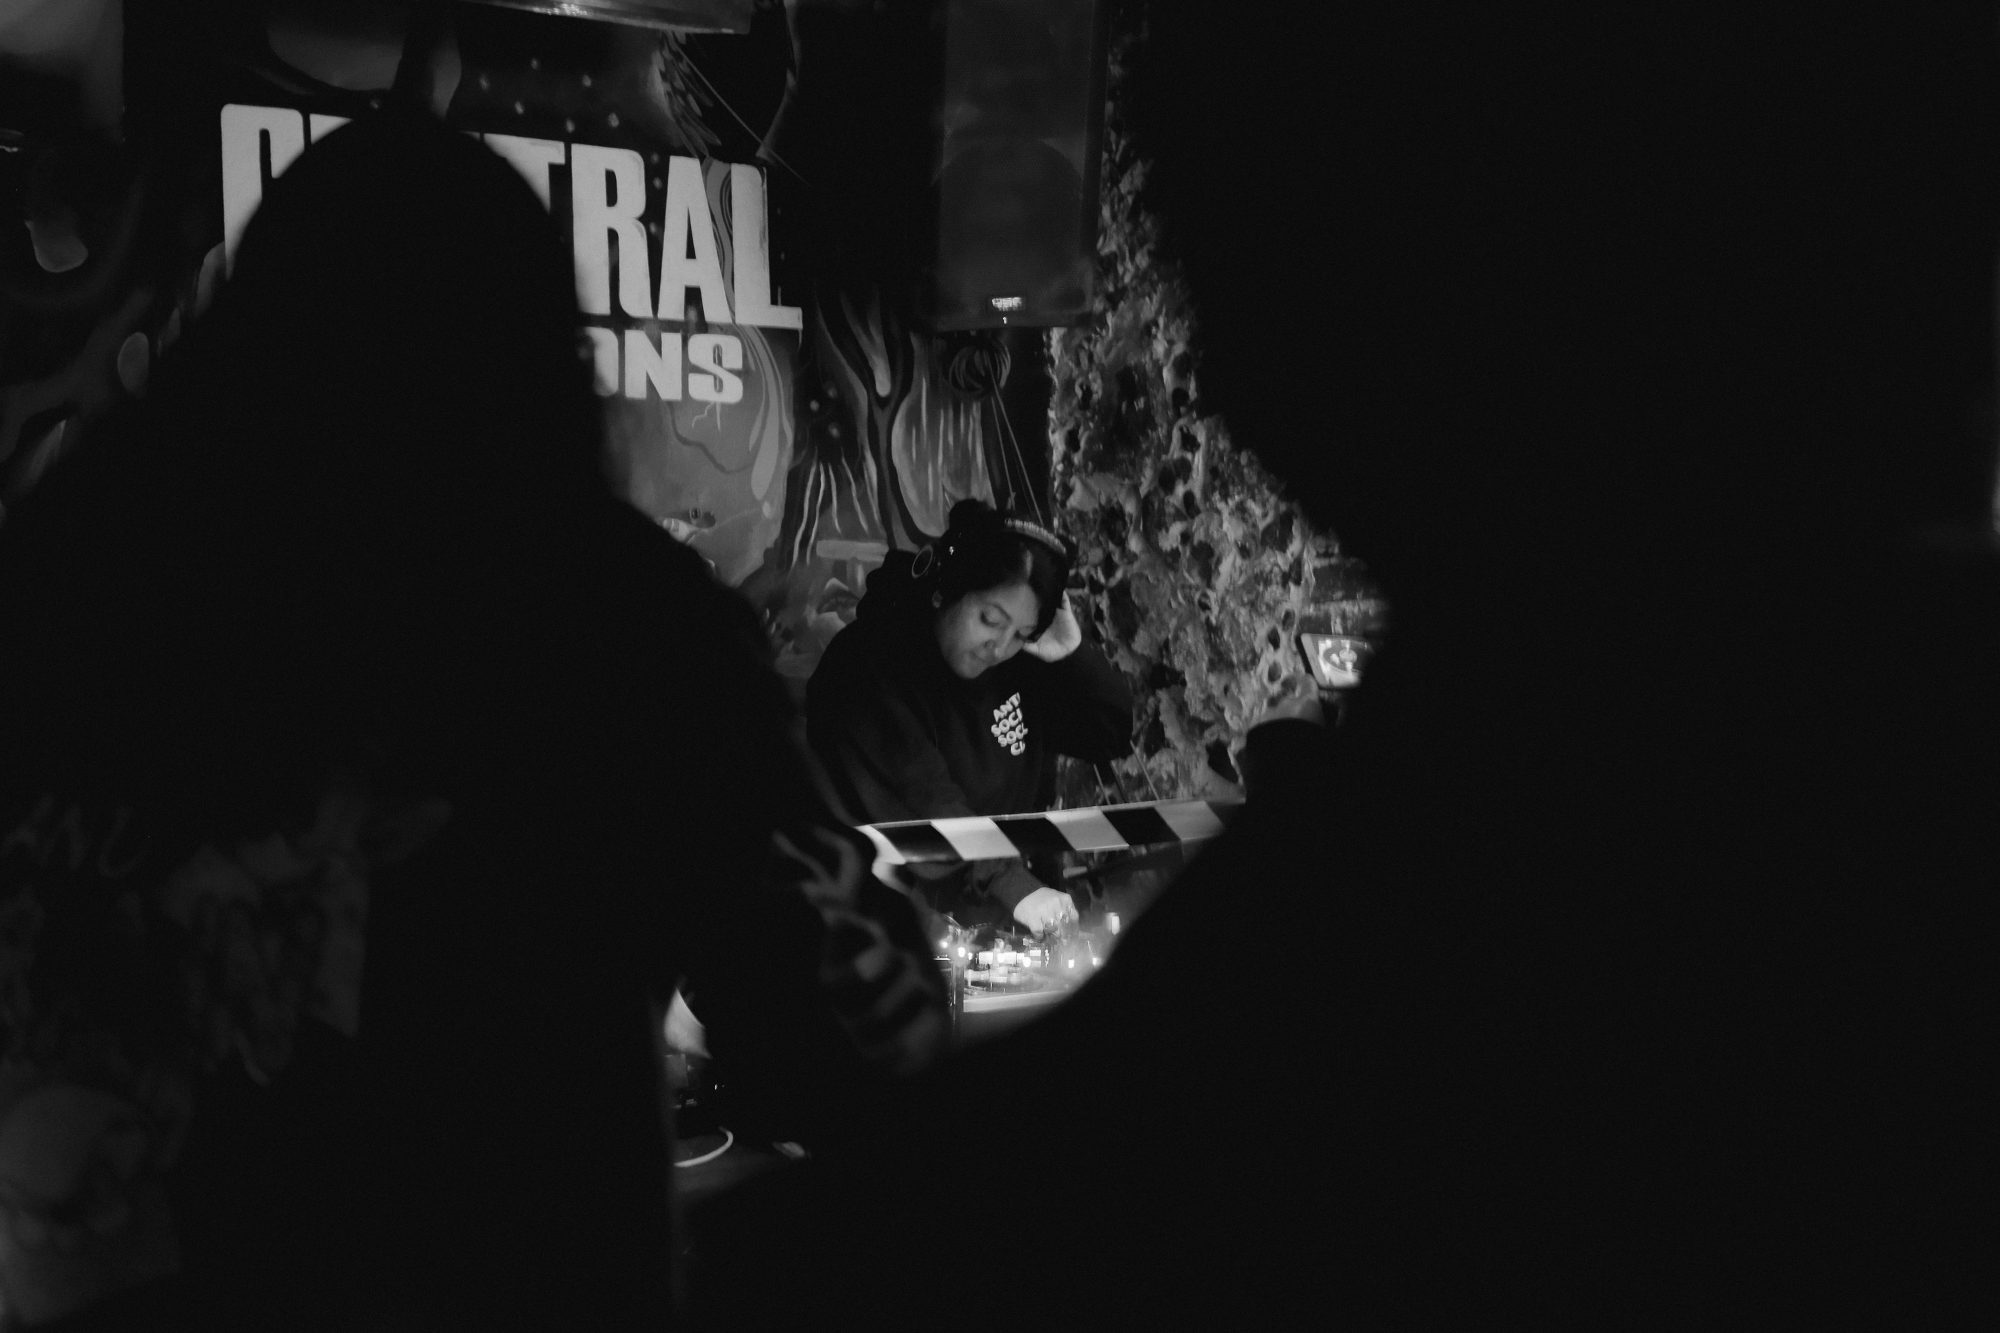 DJ-Invitada-at-Central-Funk-01-MOVELIKE© gallery item